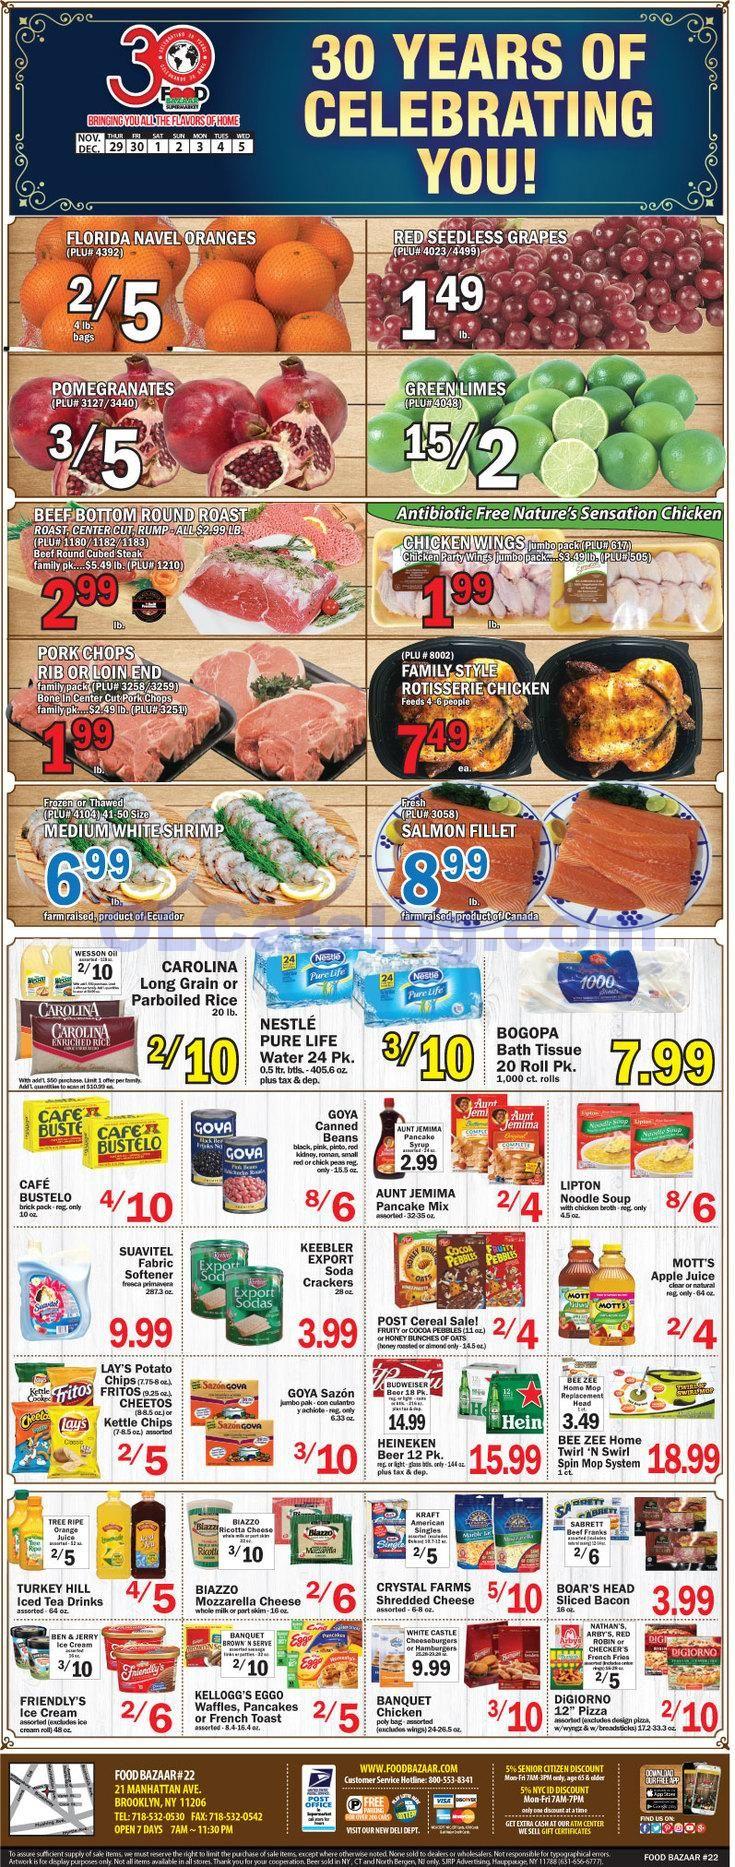 Food bazaar weekly ad november 29 december 5 2018 do